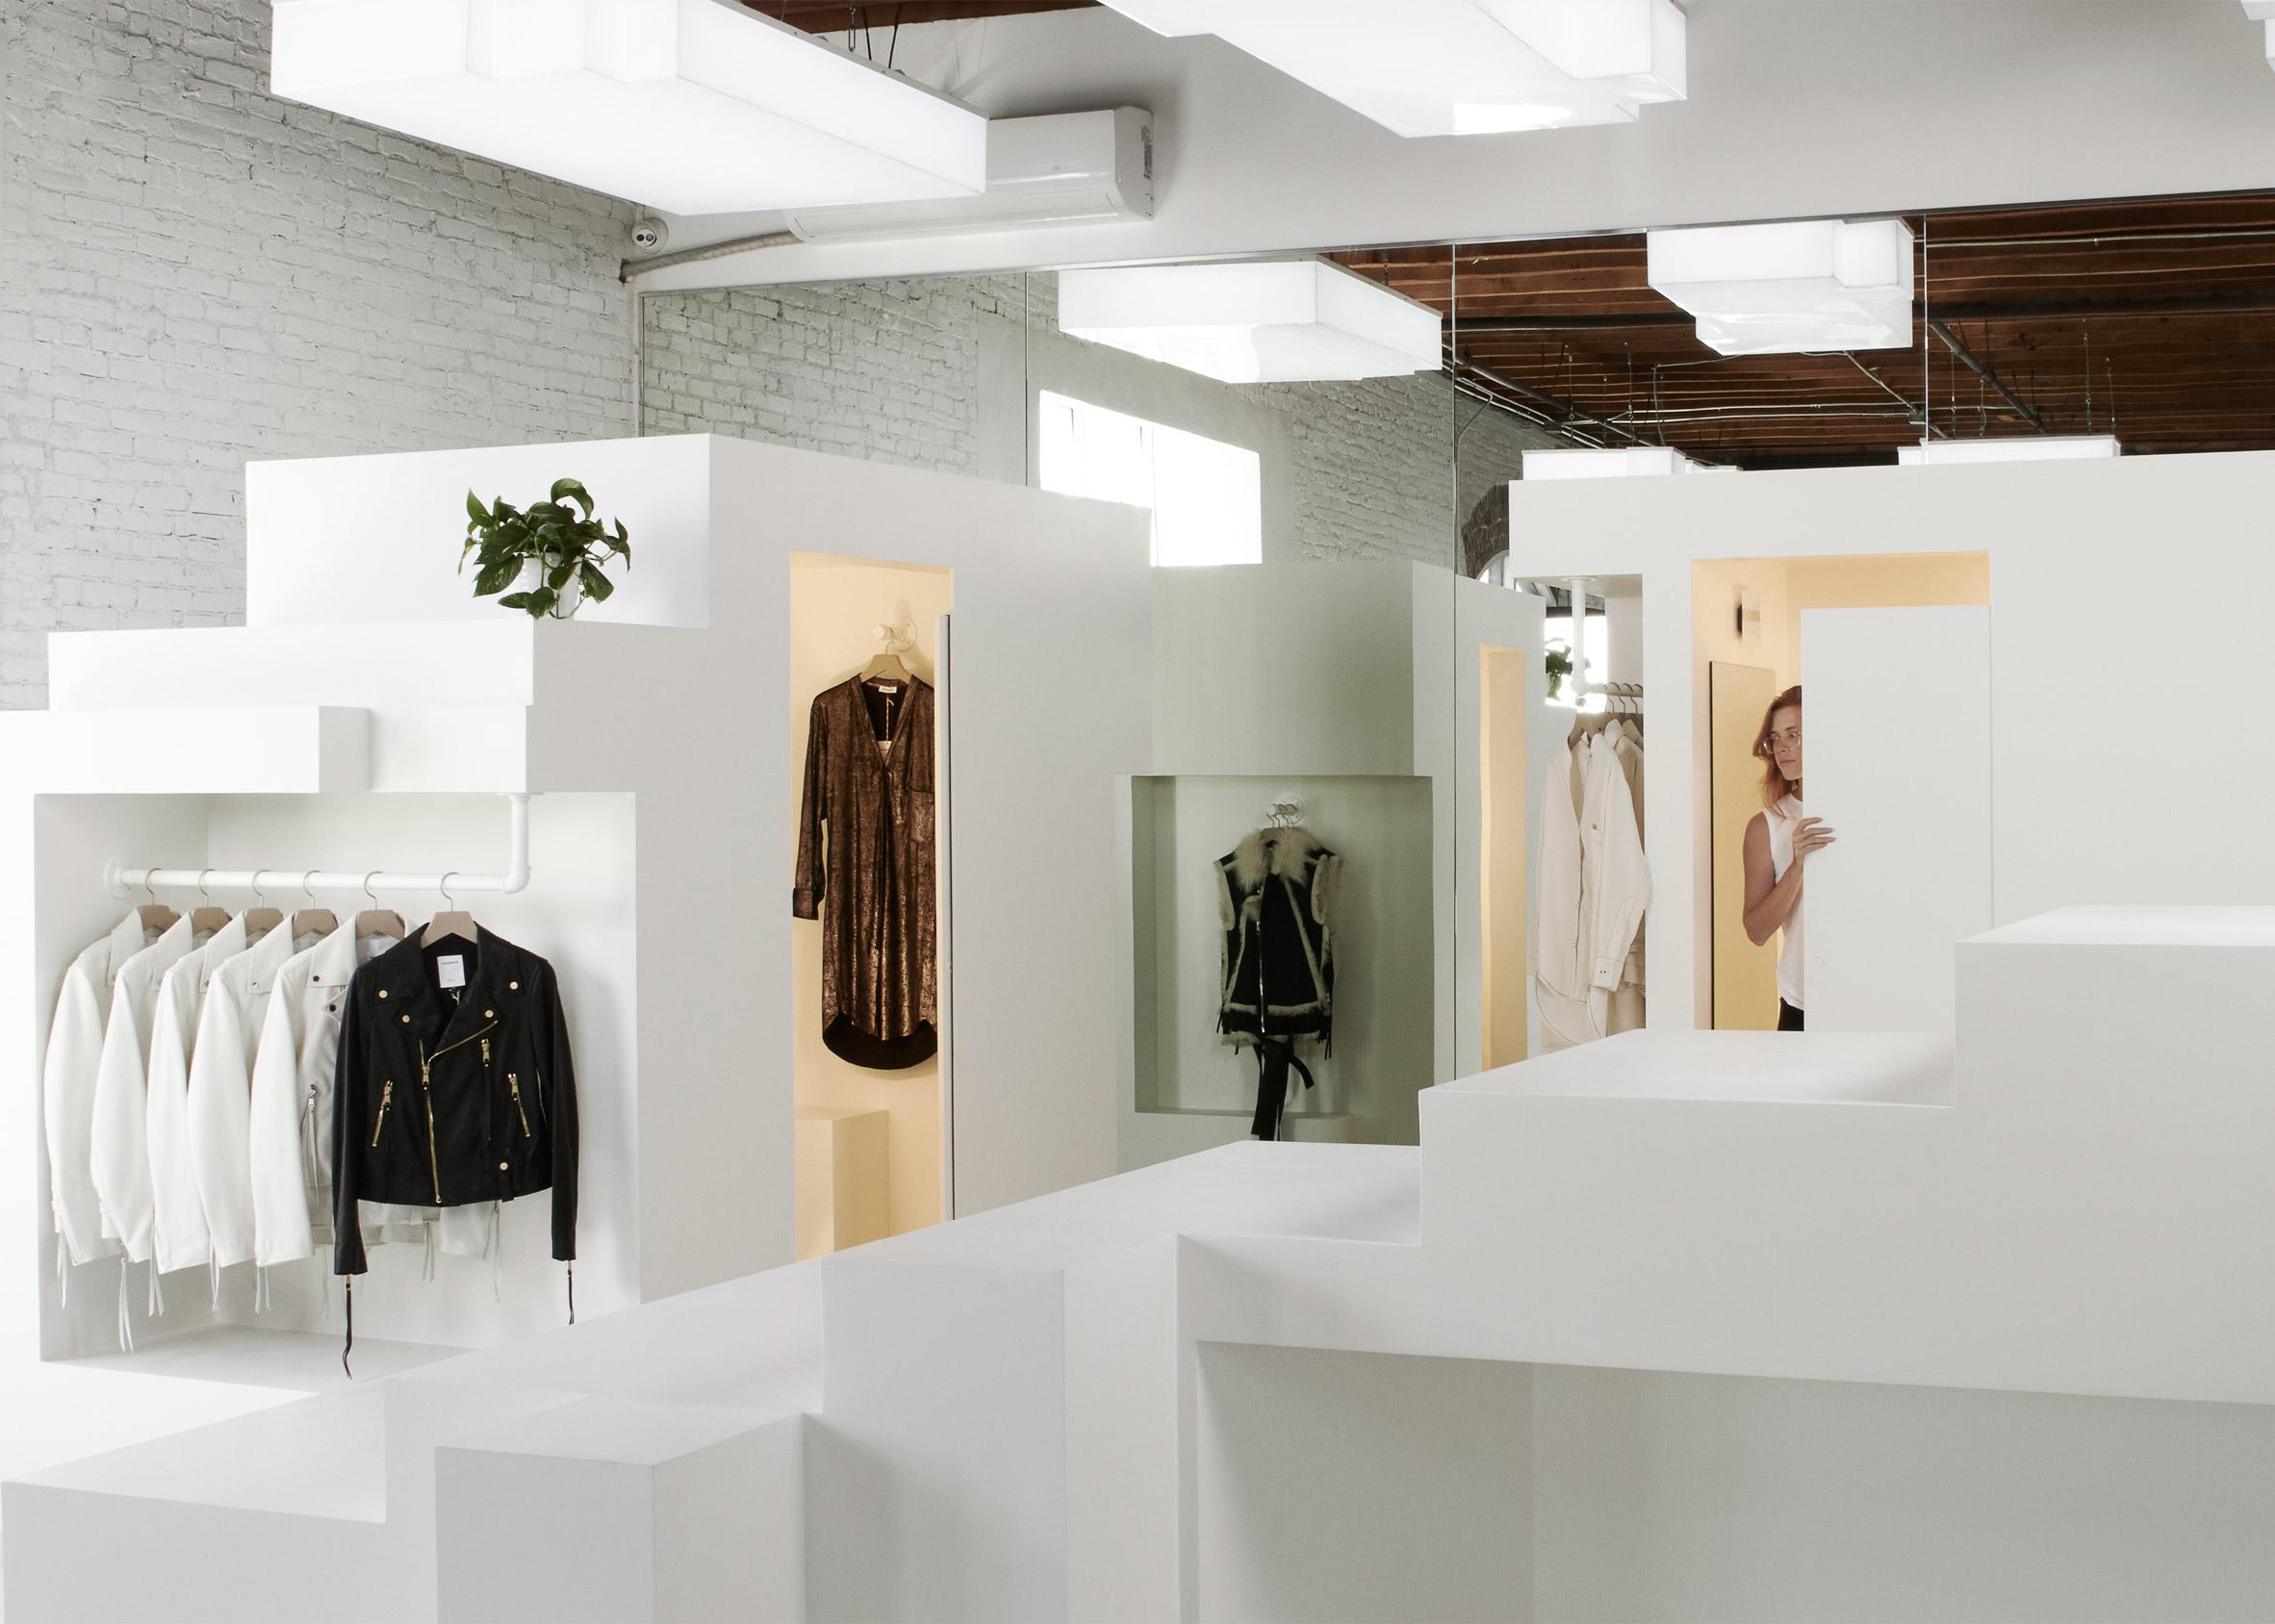 frankie-store-retail-shop-interior-fashion-bureau-spectacular-usa_dezeen_2364_ss_5.jpg